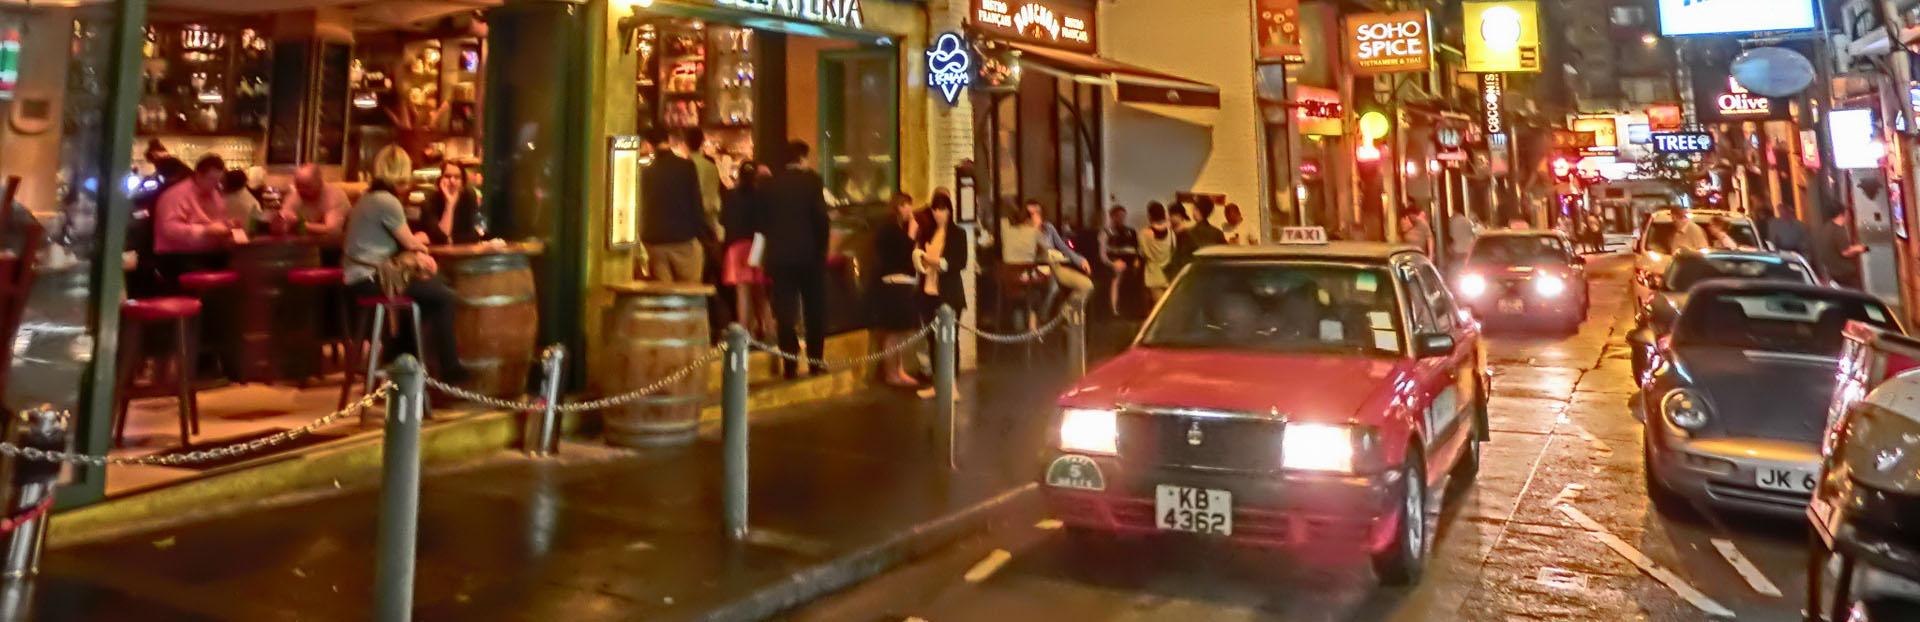 Hk central soho night elgin street restaurant nico's spuntino bar   restaurant apr 2013